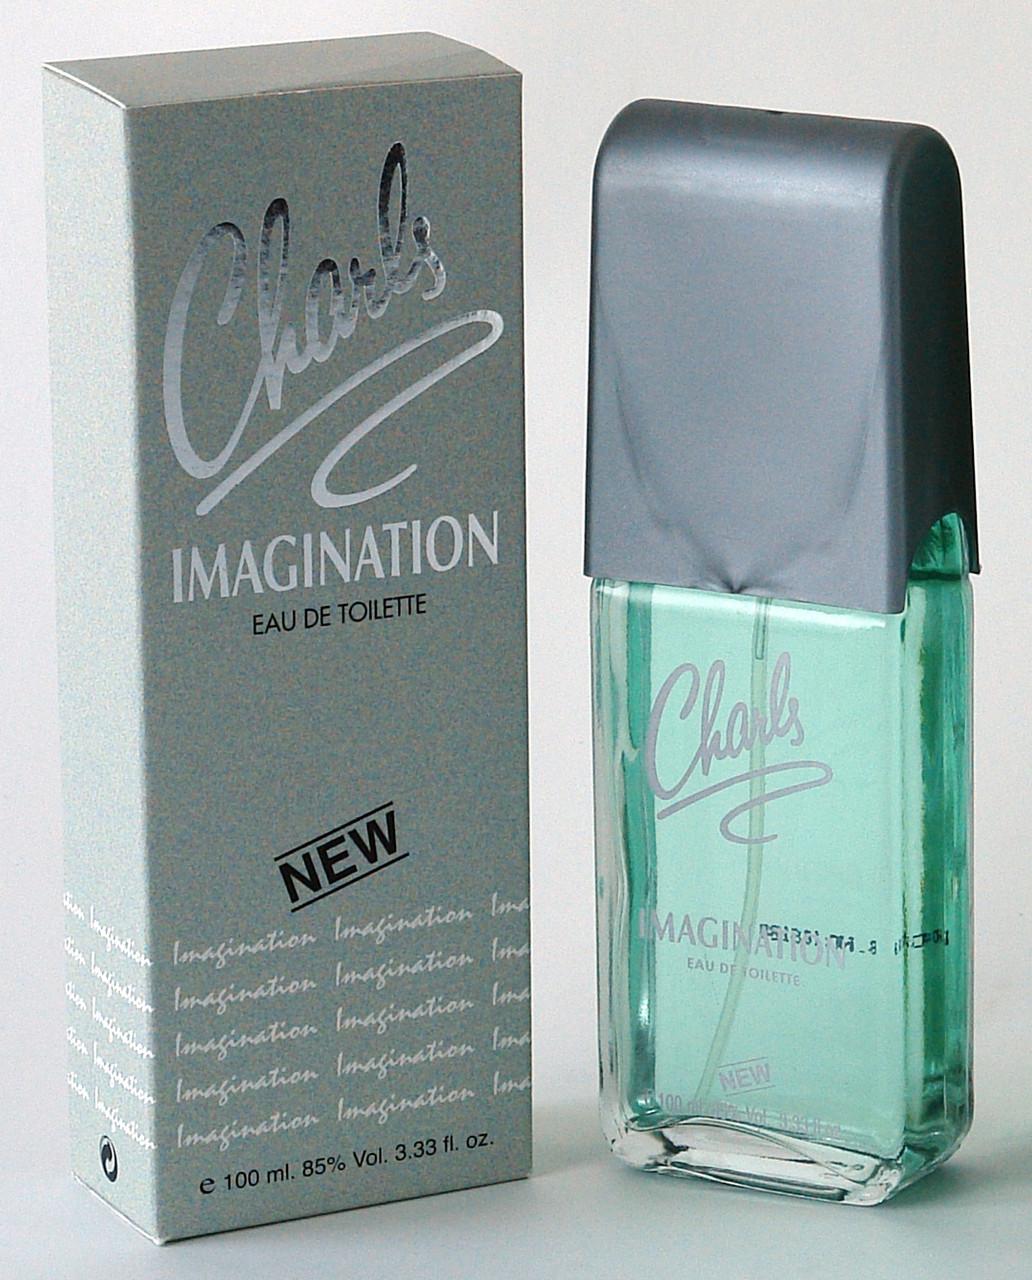 Charle Imagination 100ml